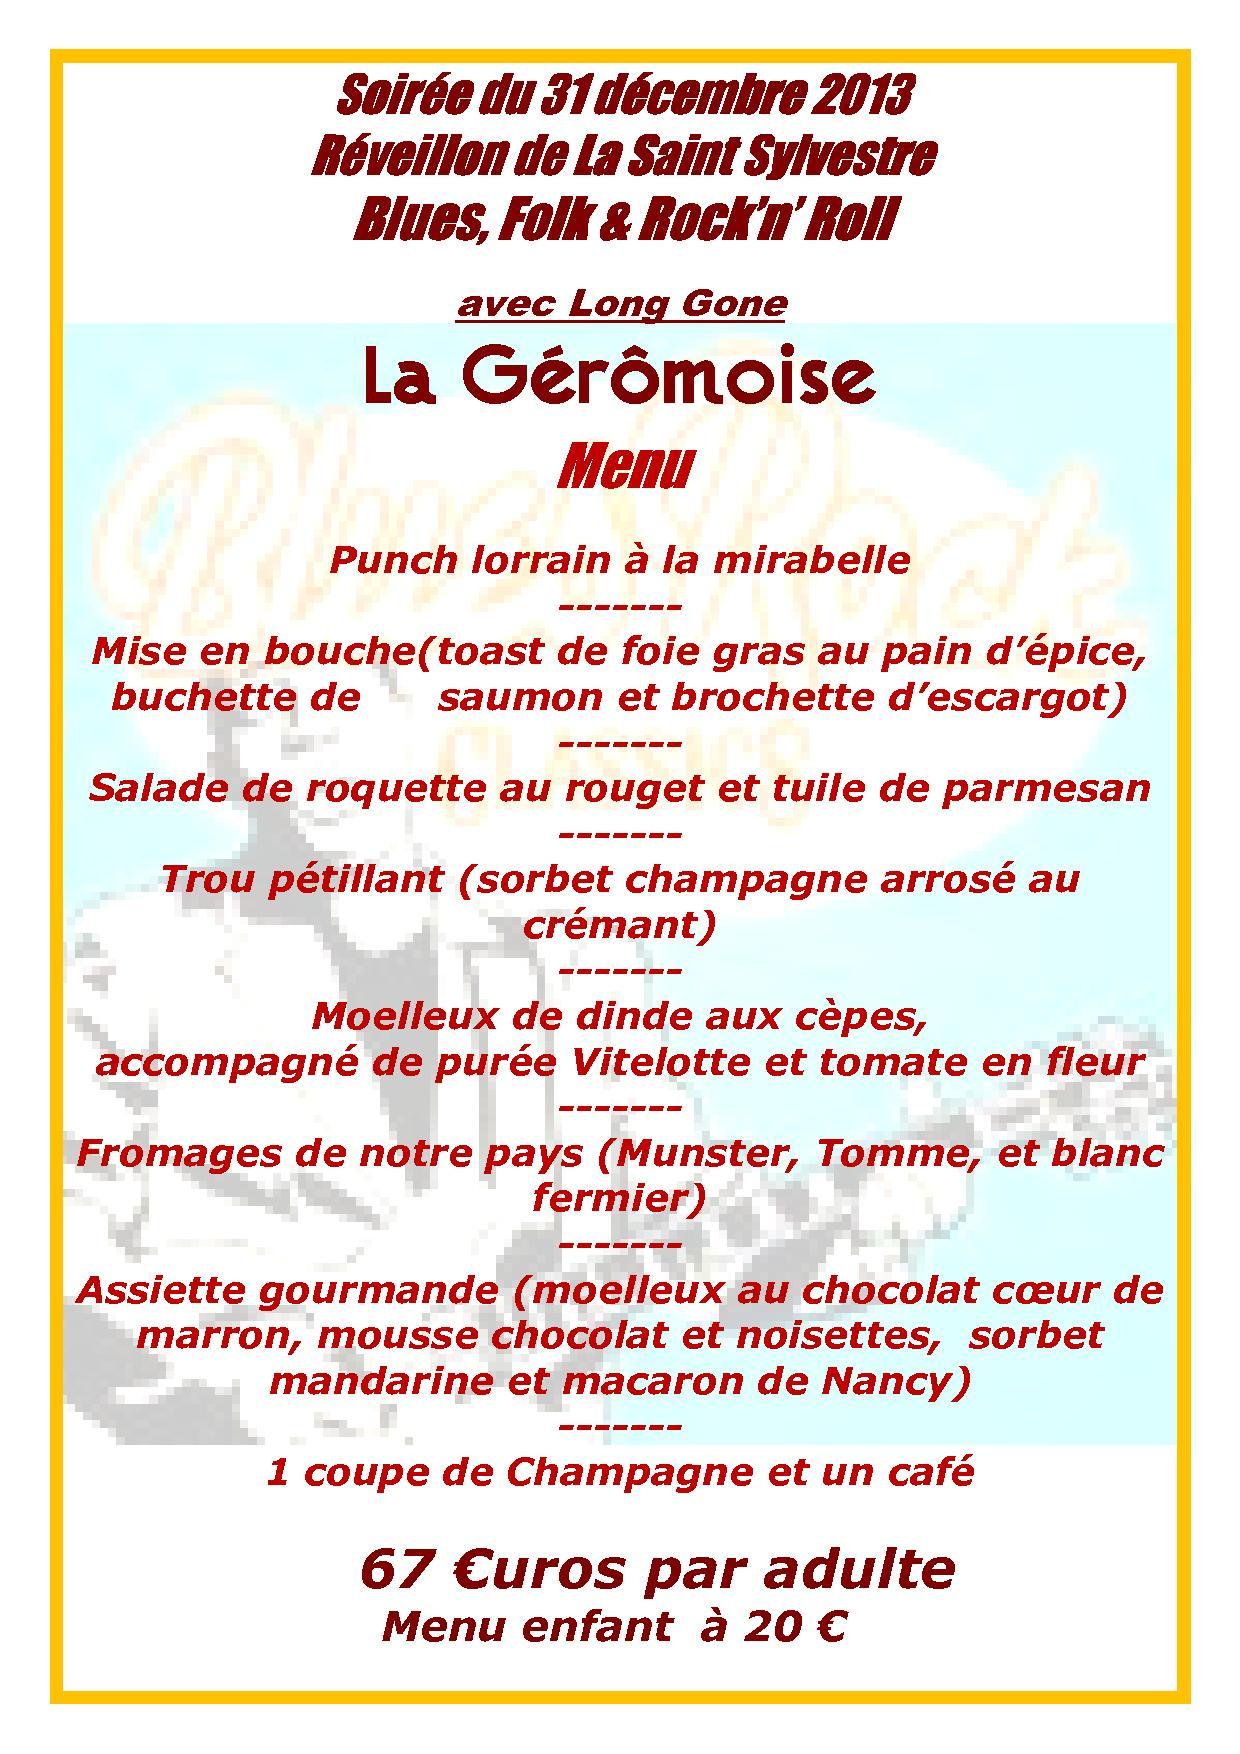 Brasserie g rardmer r veillon du 31 d cembre 2015 - Idee reveillon 31 decembre ...